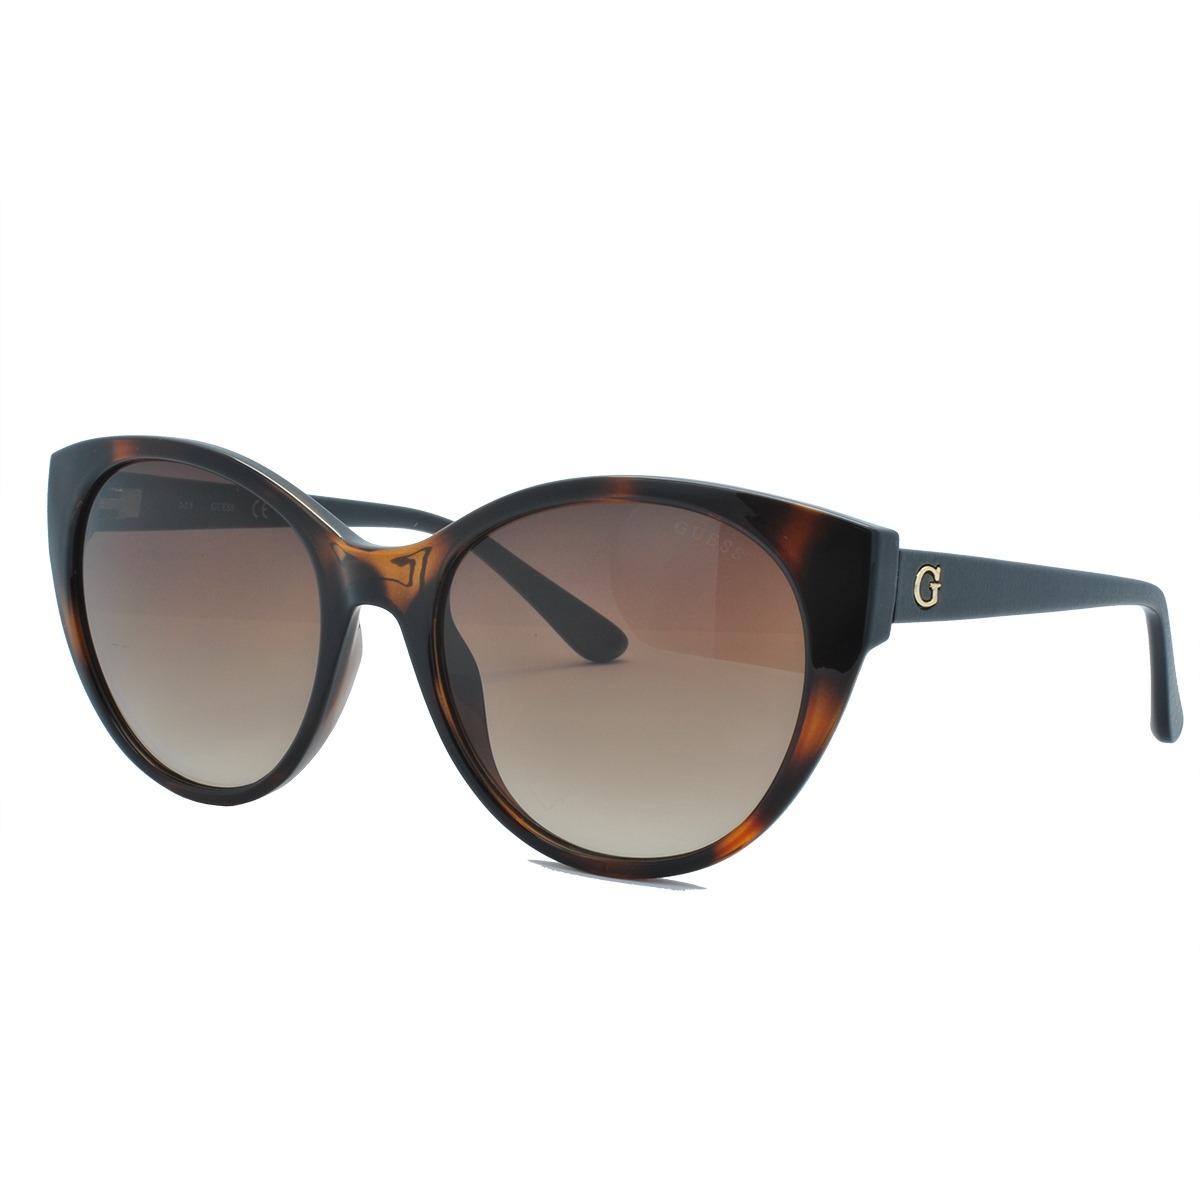 95b87649c Óculos De Sol Guess Original Feminino Gu7594 52f - R$ 460,00 em ...